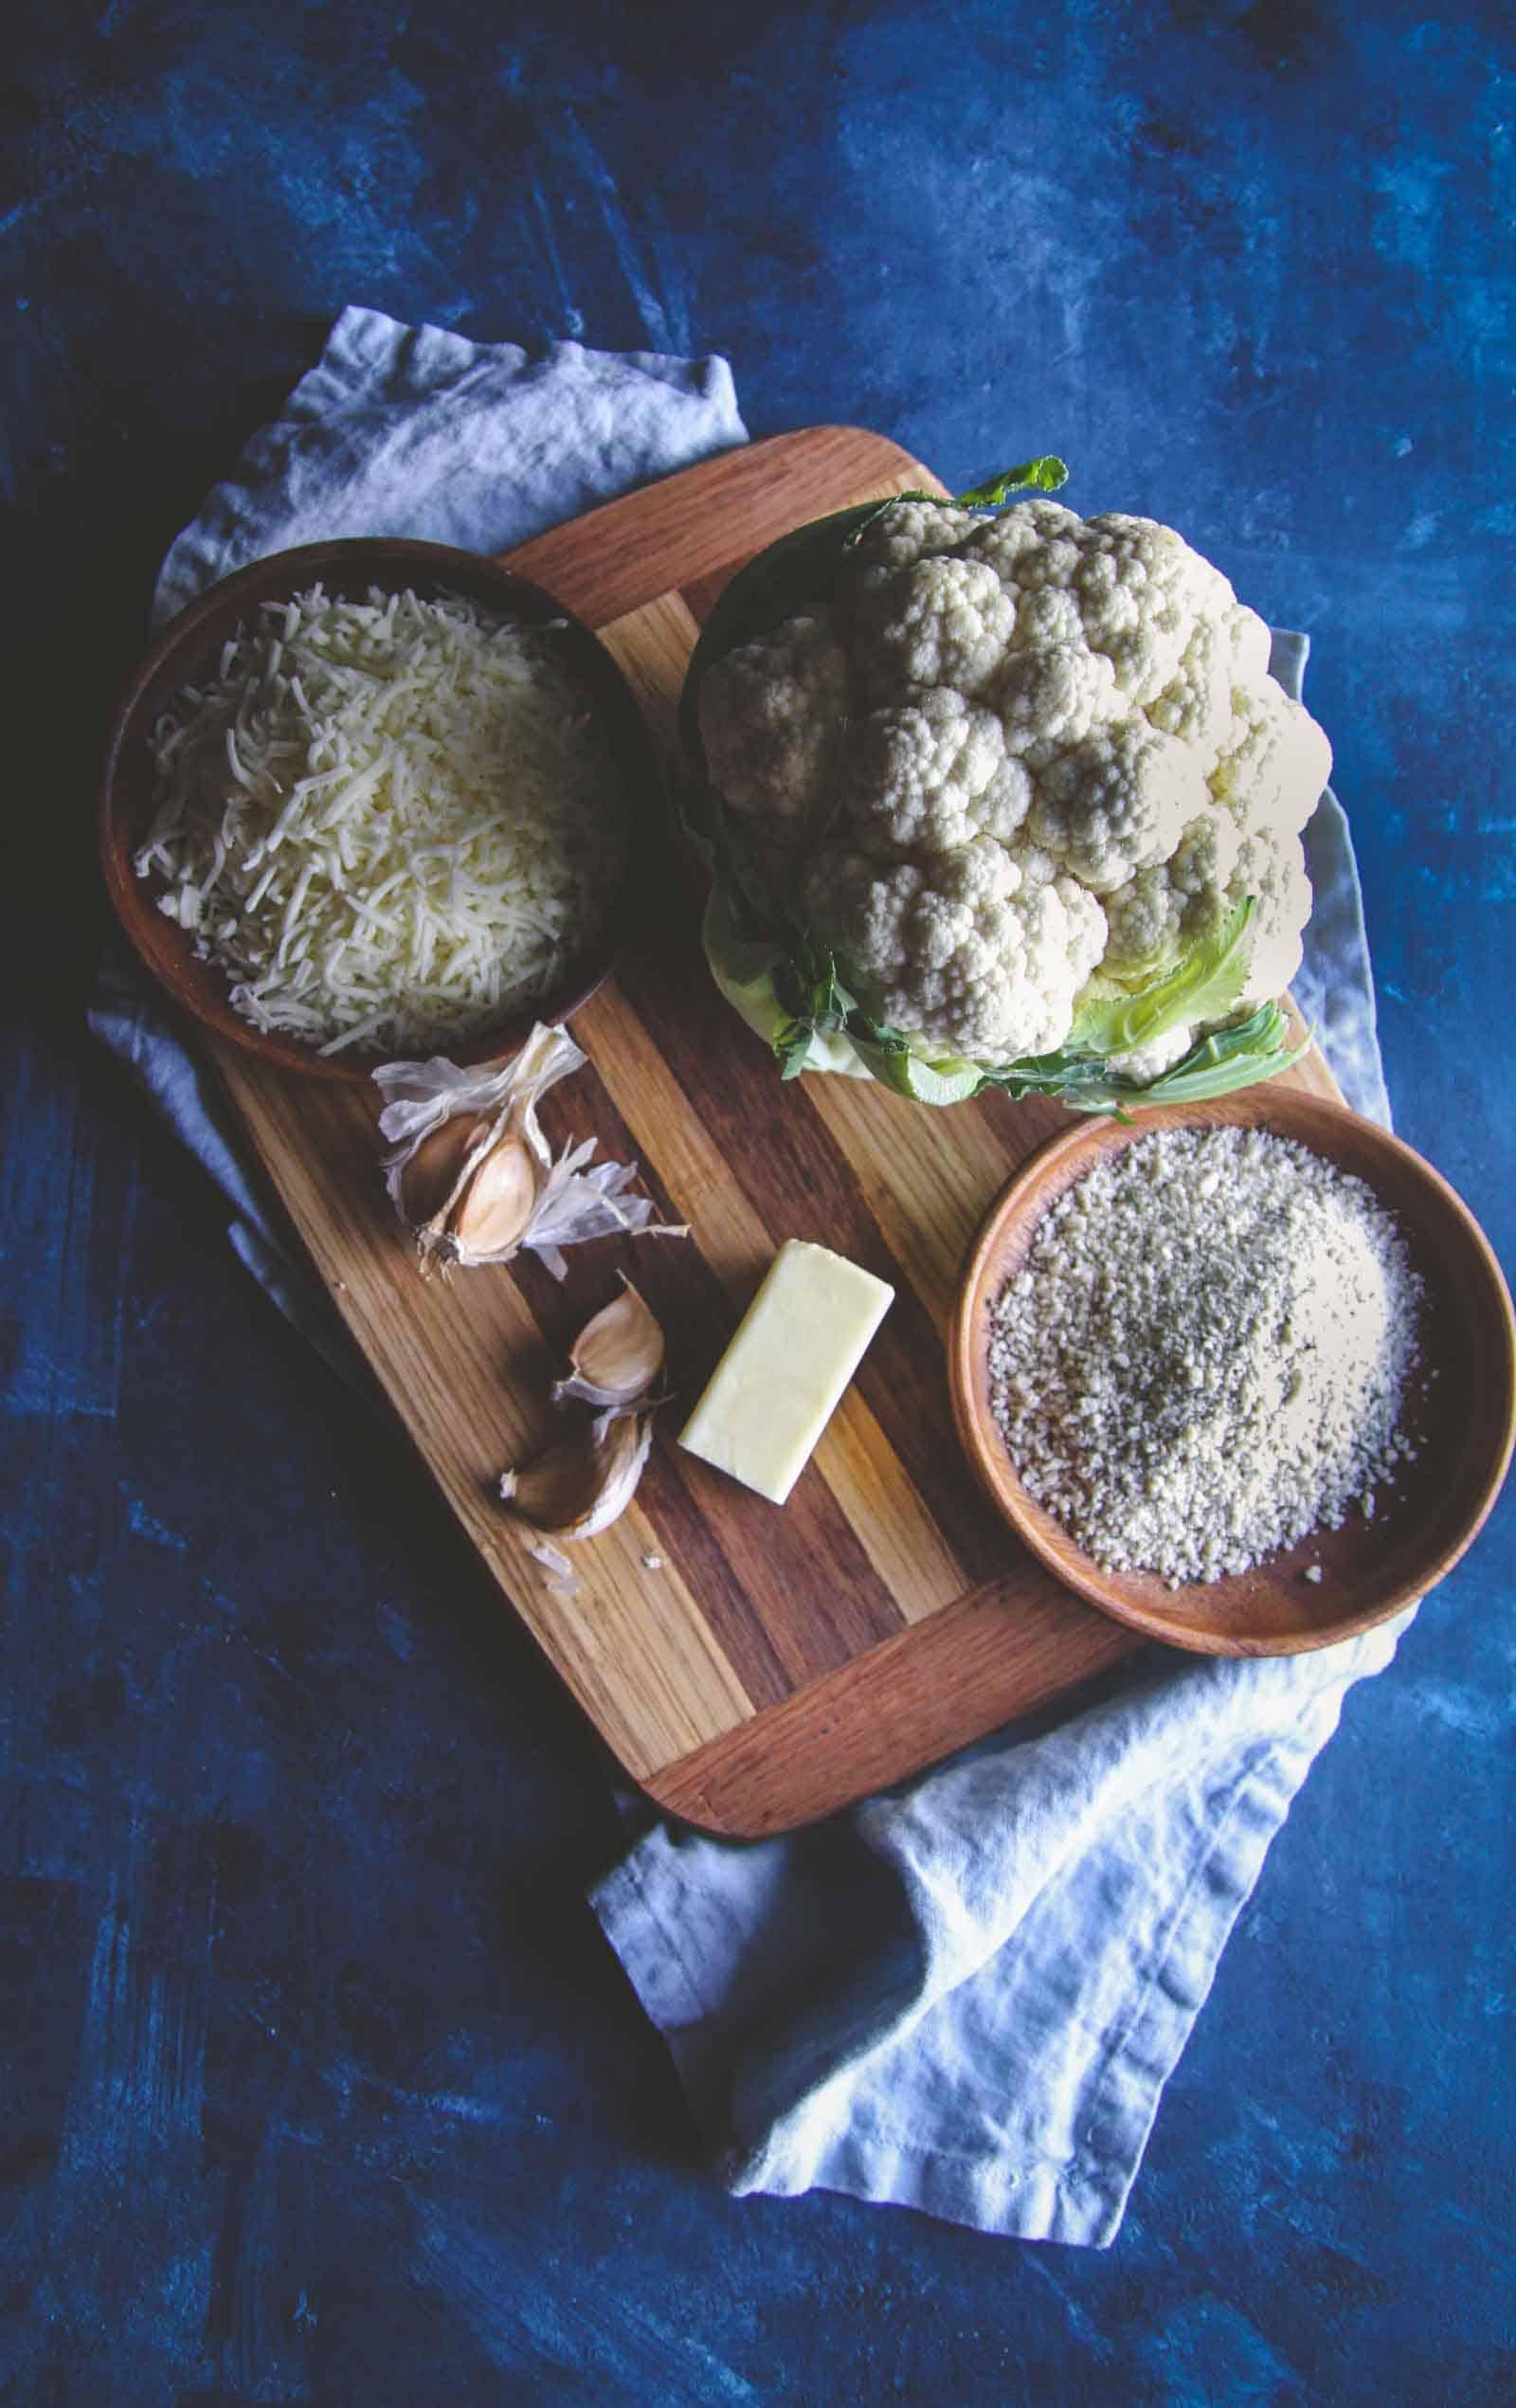 The best side dish is this 5 ingredient vegetarian cheesy cauliflower bake